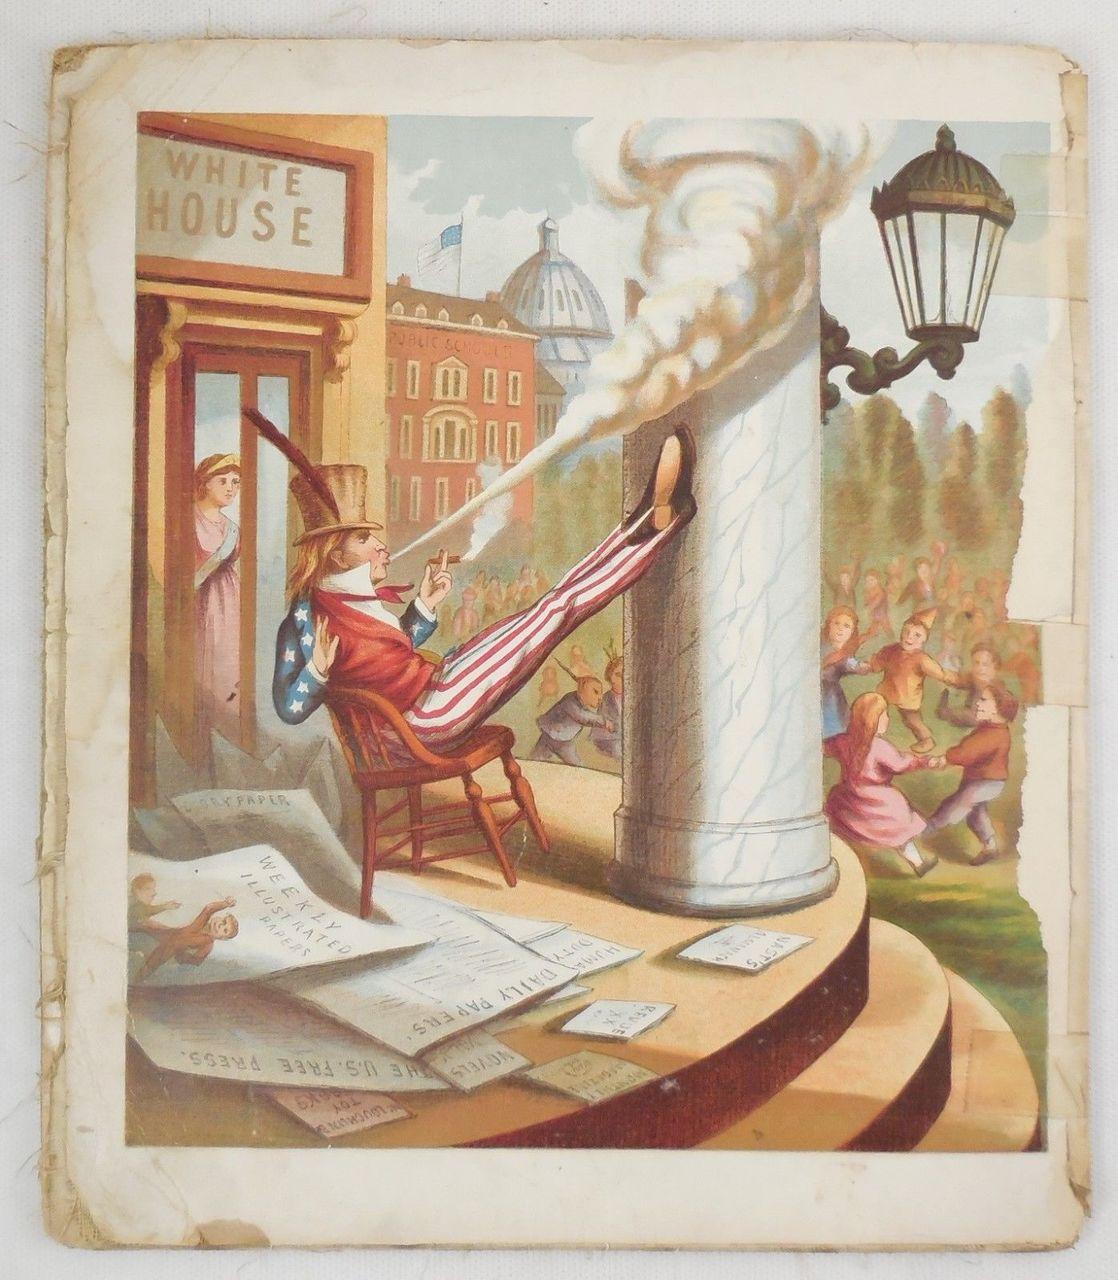 YANKEE DOODLE, by Thomas Nast - c.1880